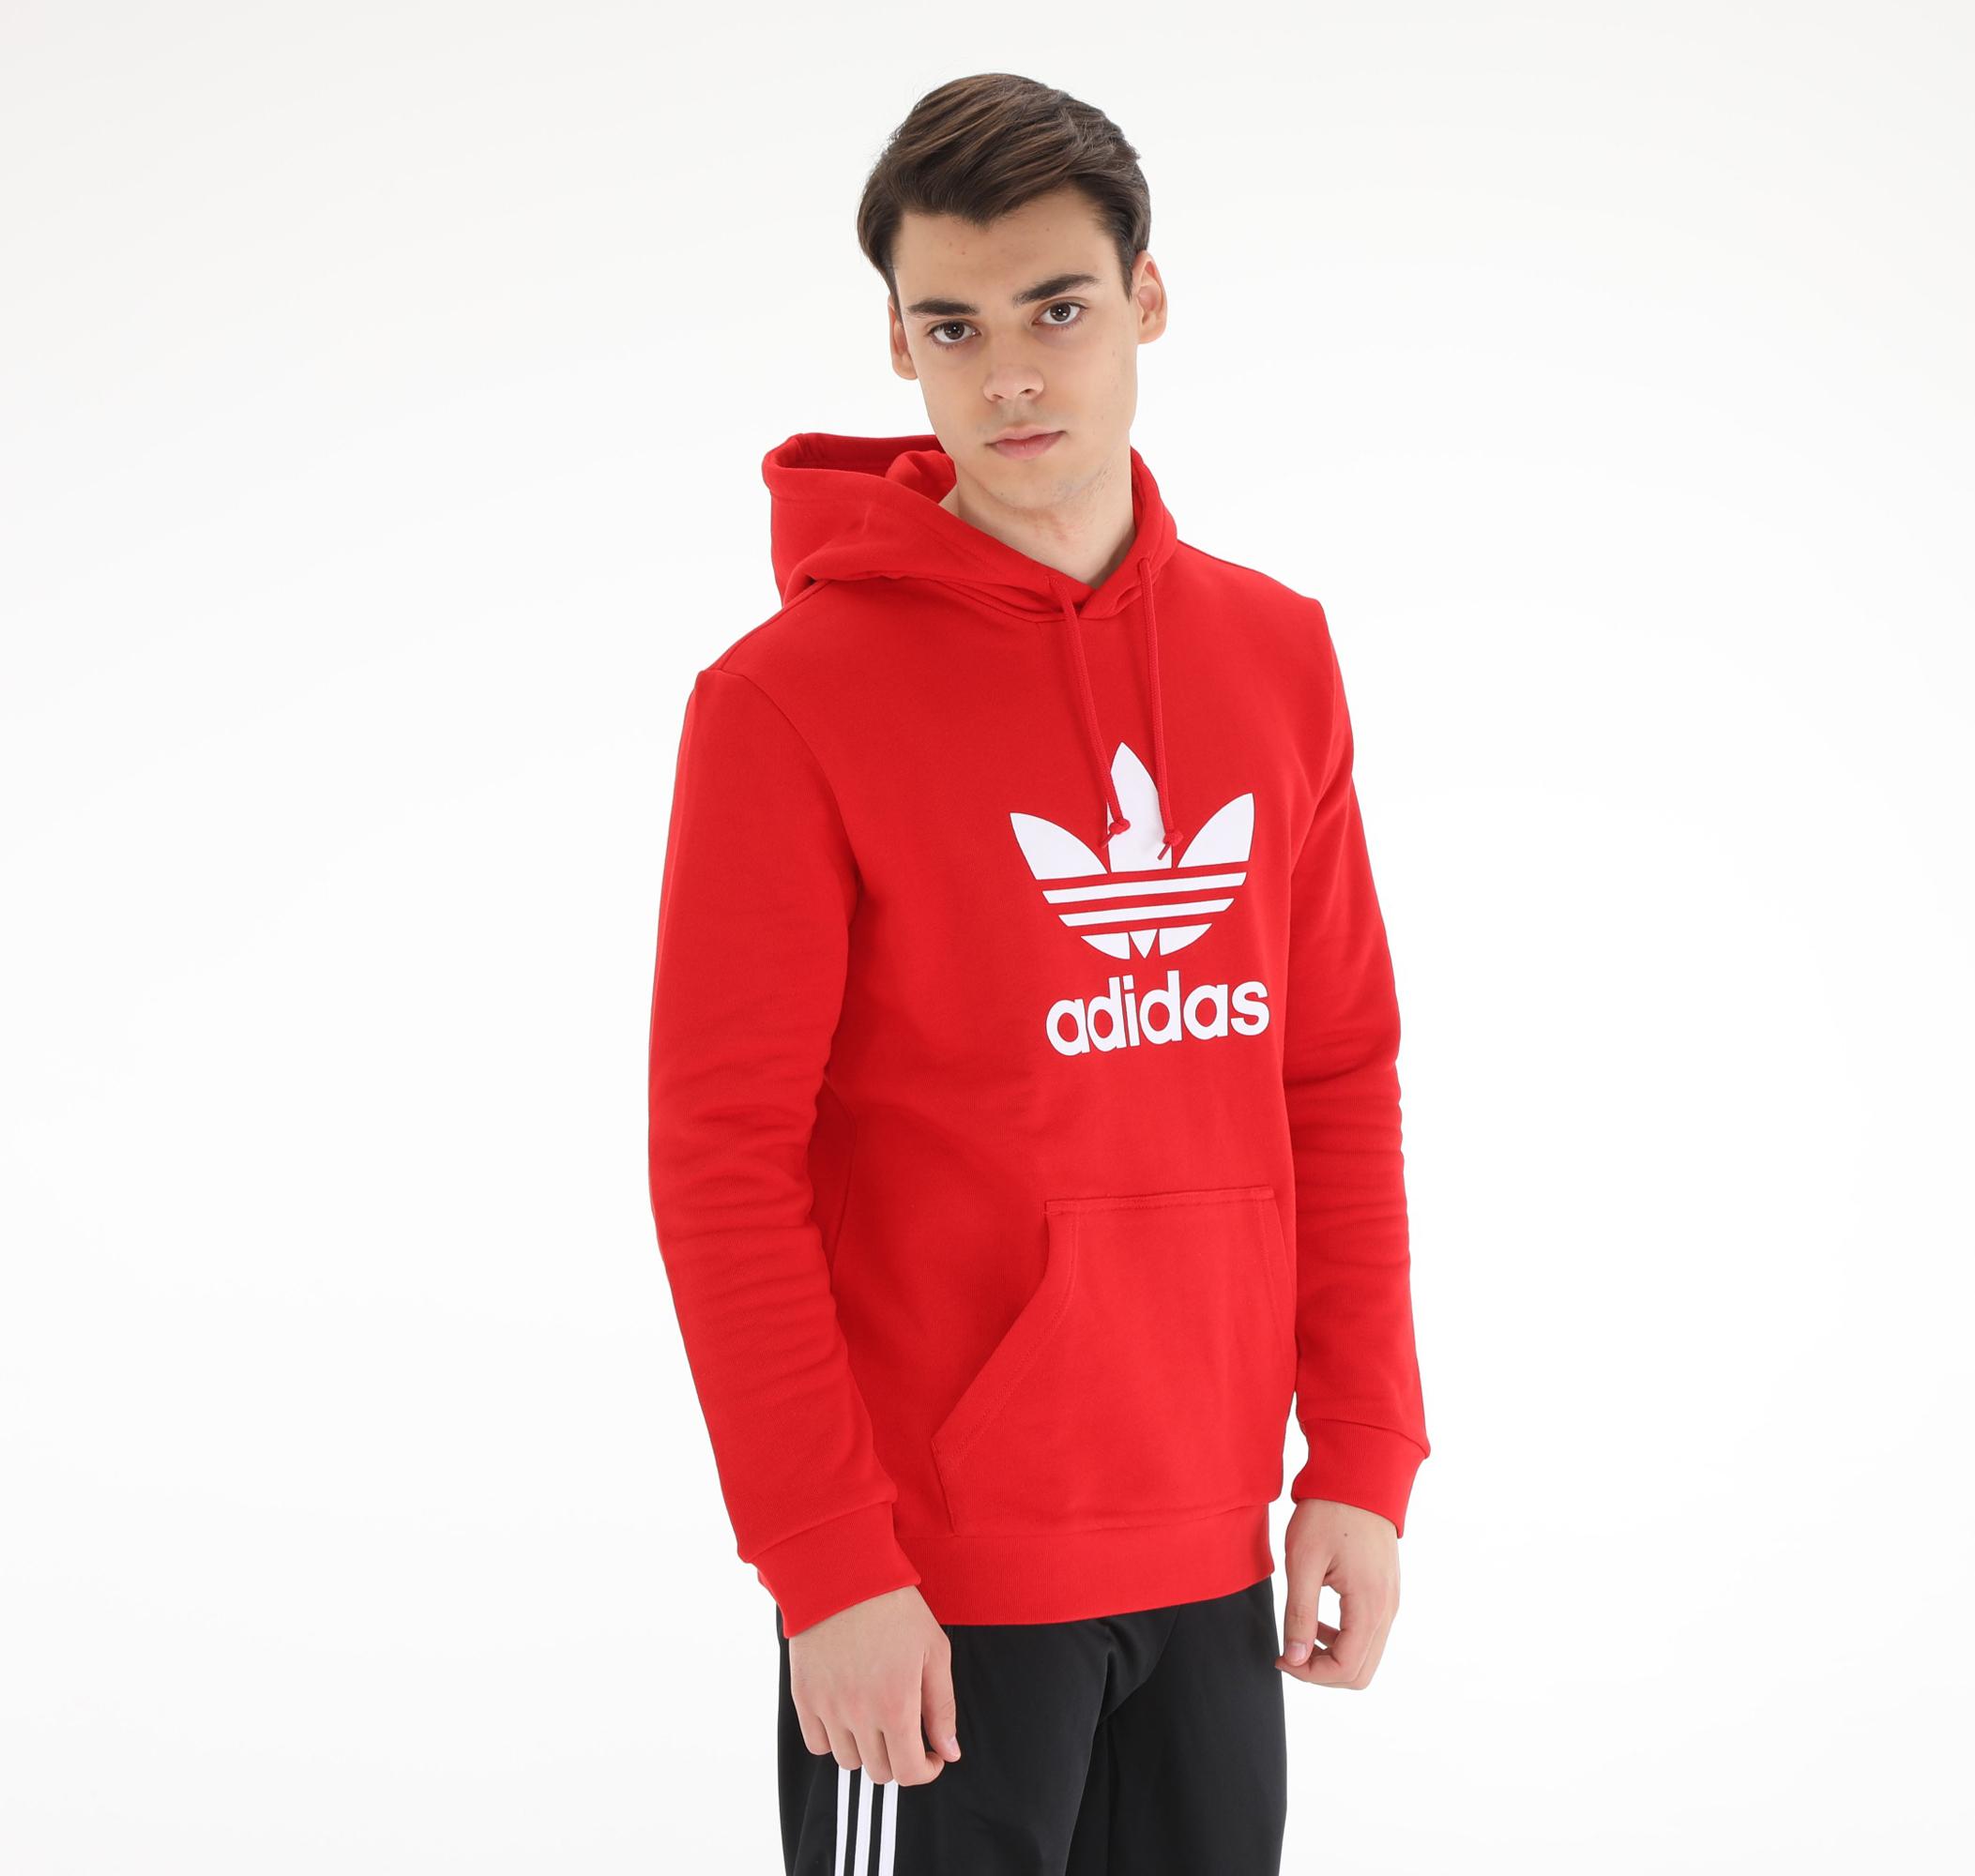 adidas Trefoıl Hoodıe Erkek Sweatshirt Kırmızı